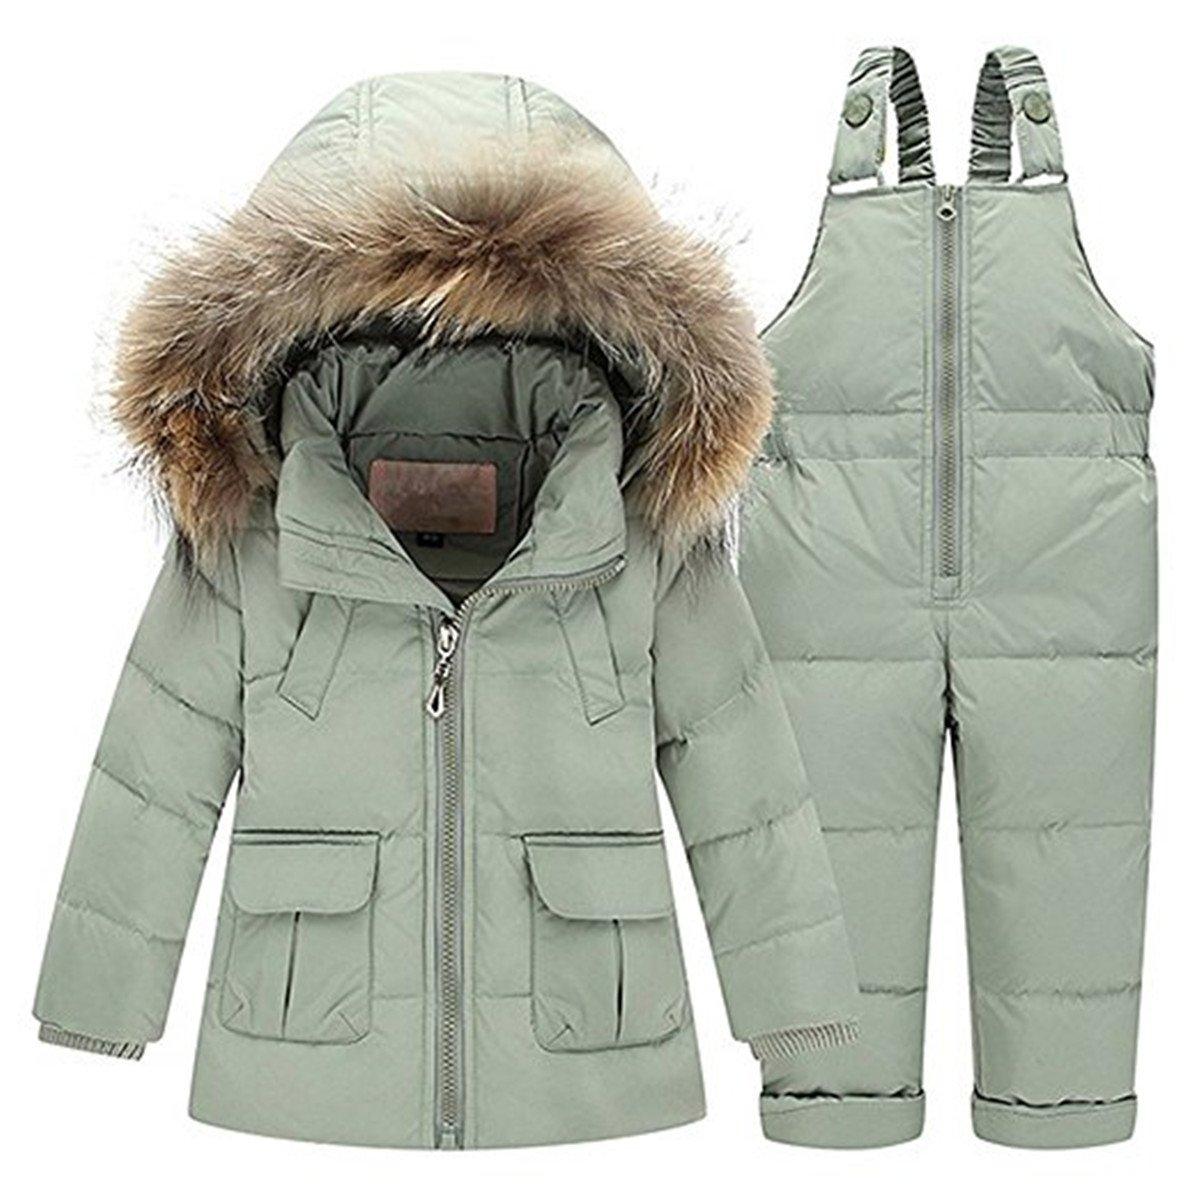 JELEUON Baby Girls Two Piece Winter Warm Hooded Fur Trim Snowsuit Puffer Down Jacket with Snow Ski Bib Pants Outfits by JELEUON